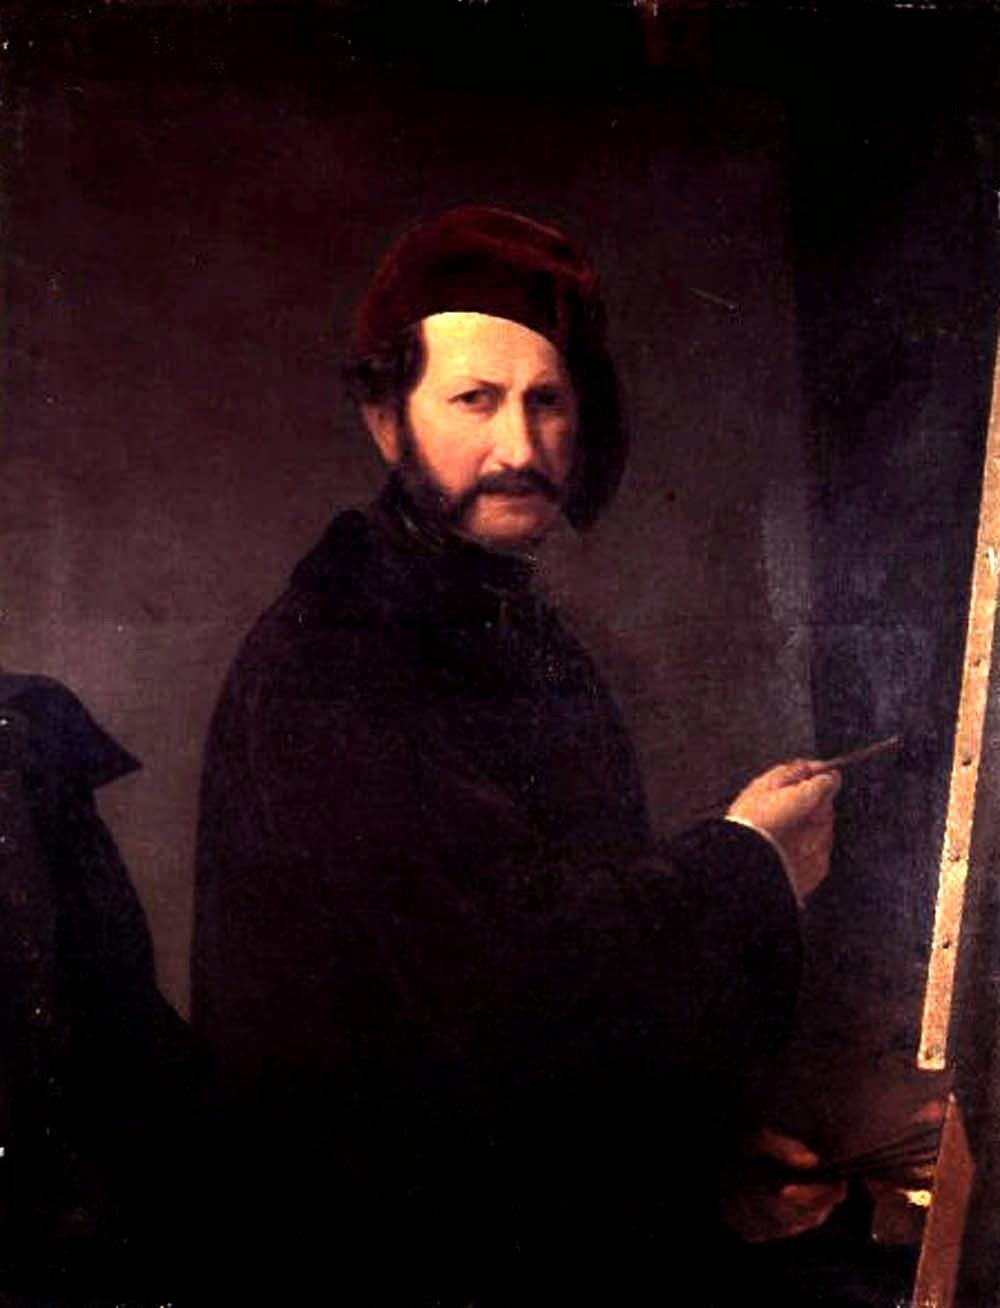 Giuseppe Sogni, Self Portrait, Portraits of Painters, Fine arts, Portraits of painters blog, Paintings of Giuseppe Sogni, Painter Giuseppe Sogni